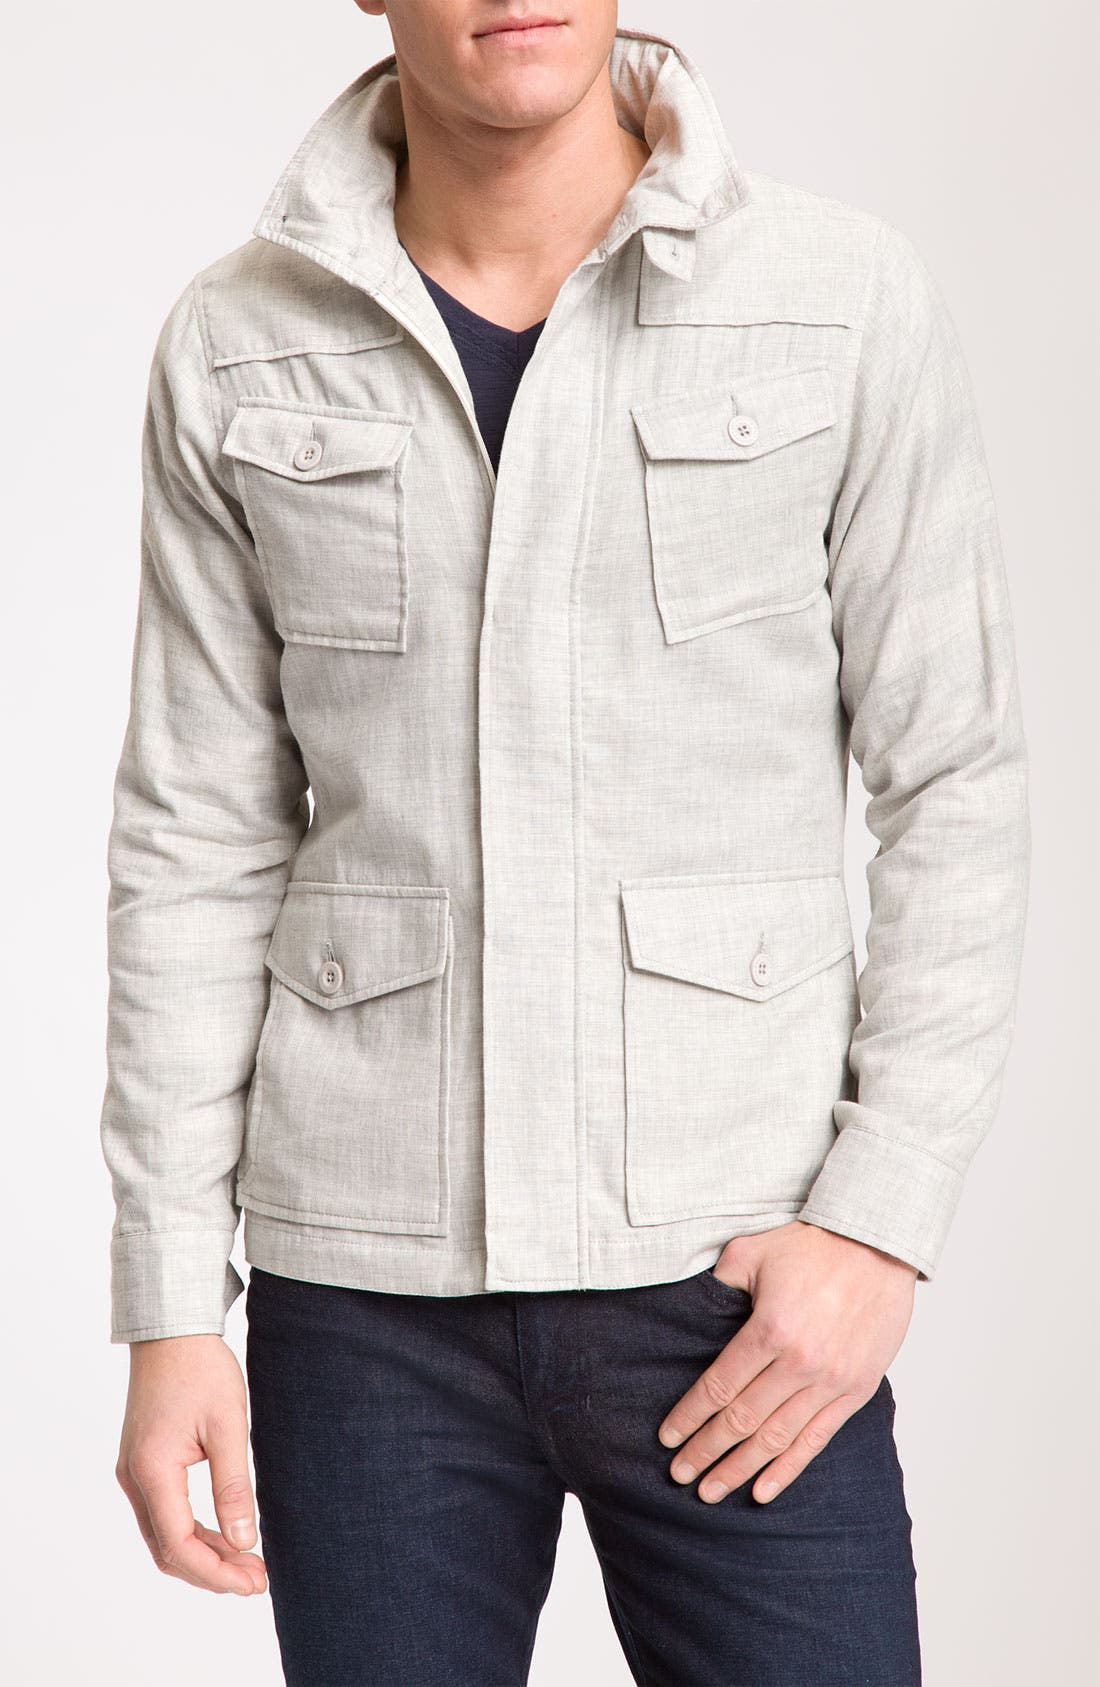 Alternate Image 1 Selected - Kane & Unke Trim Fit Cotton Jacket